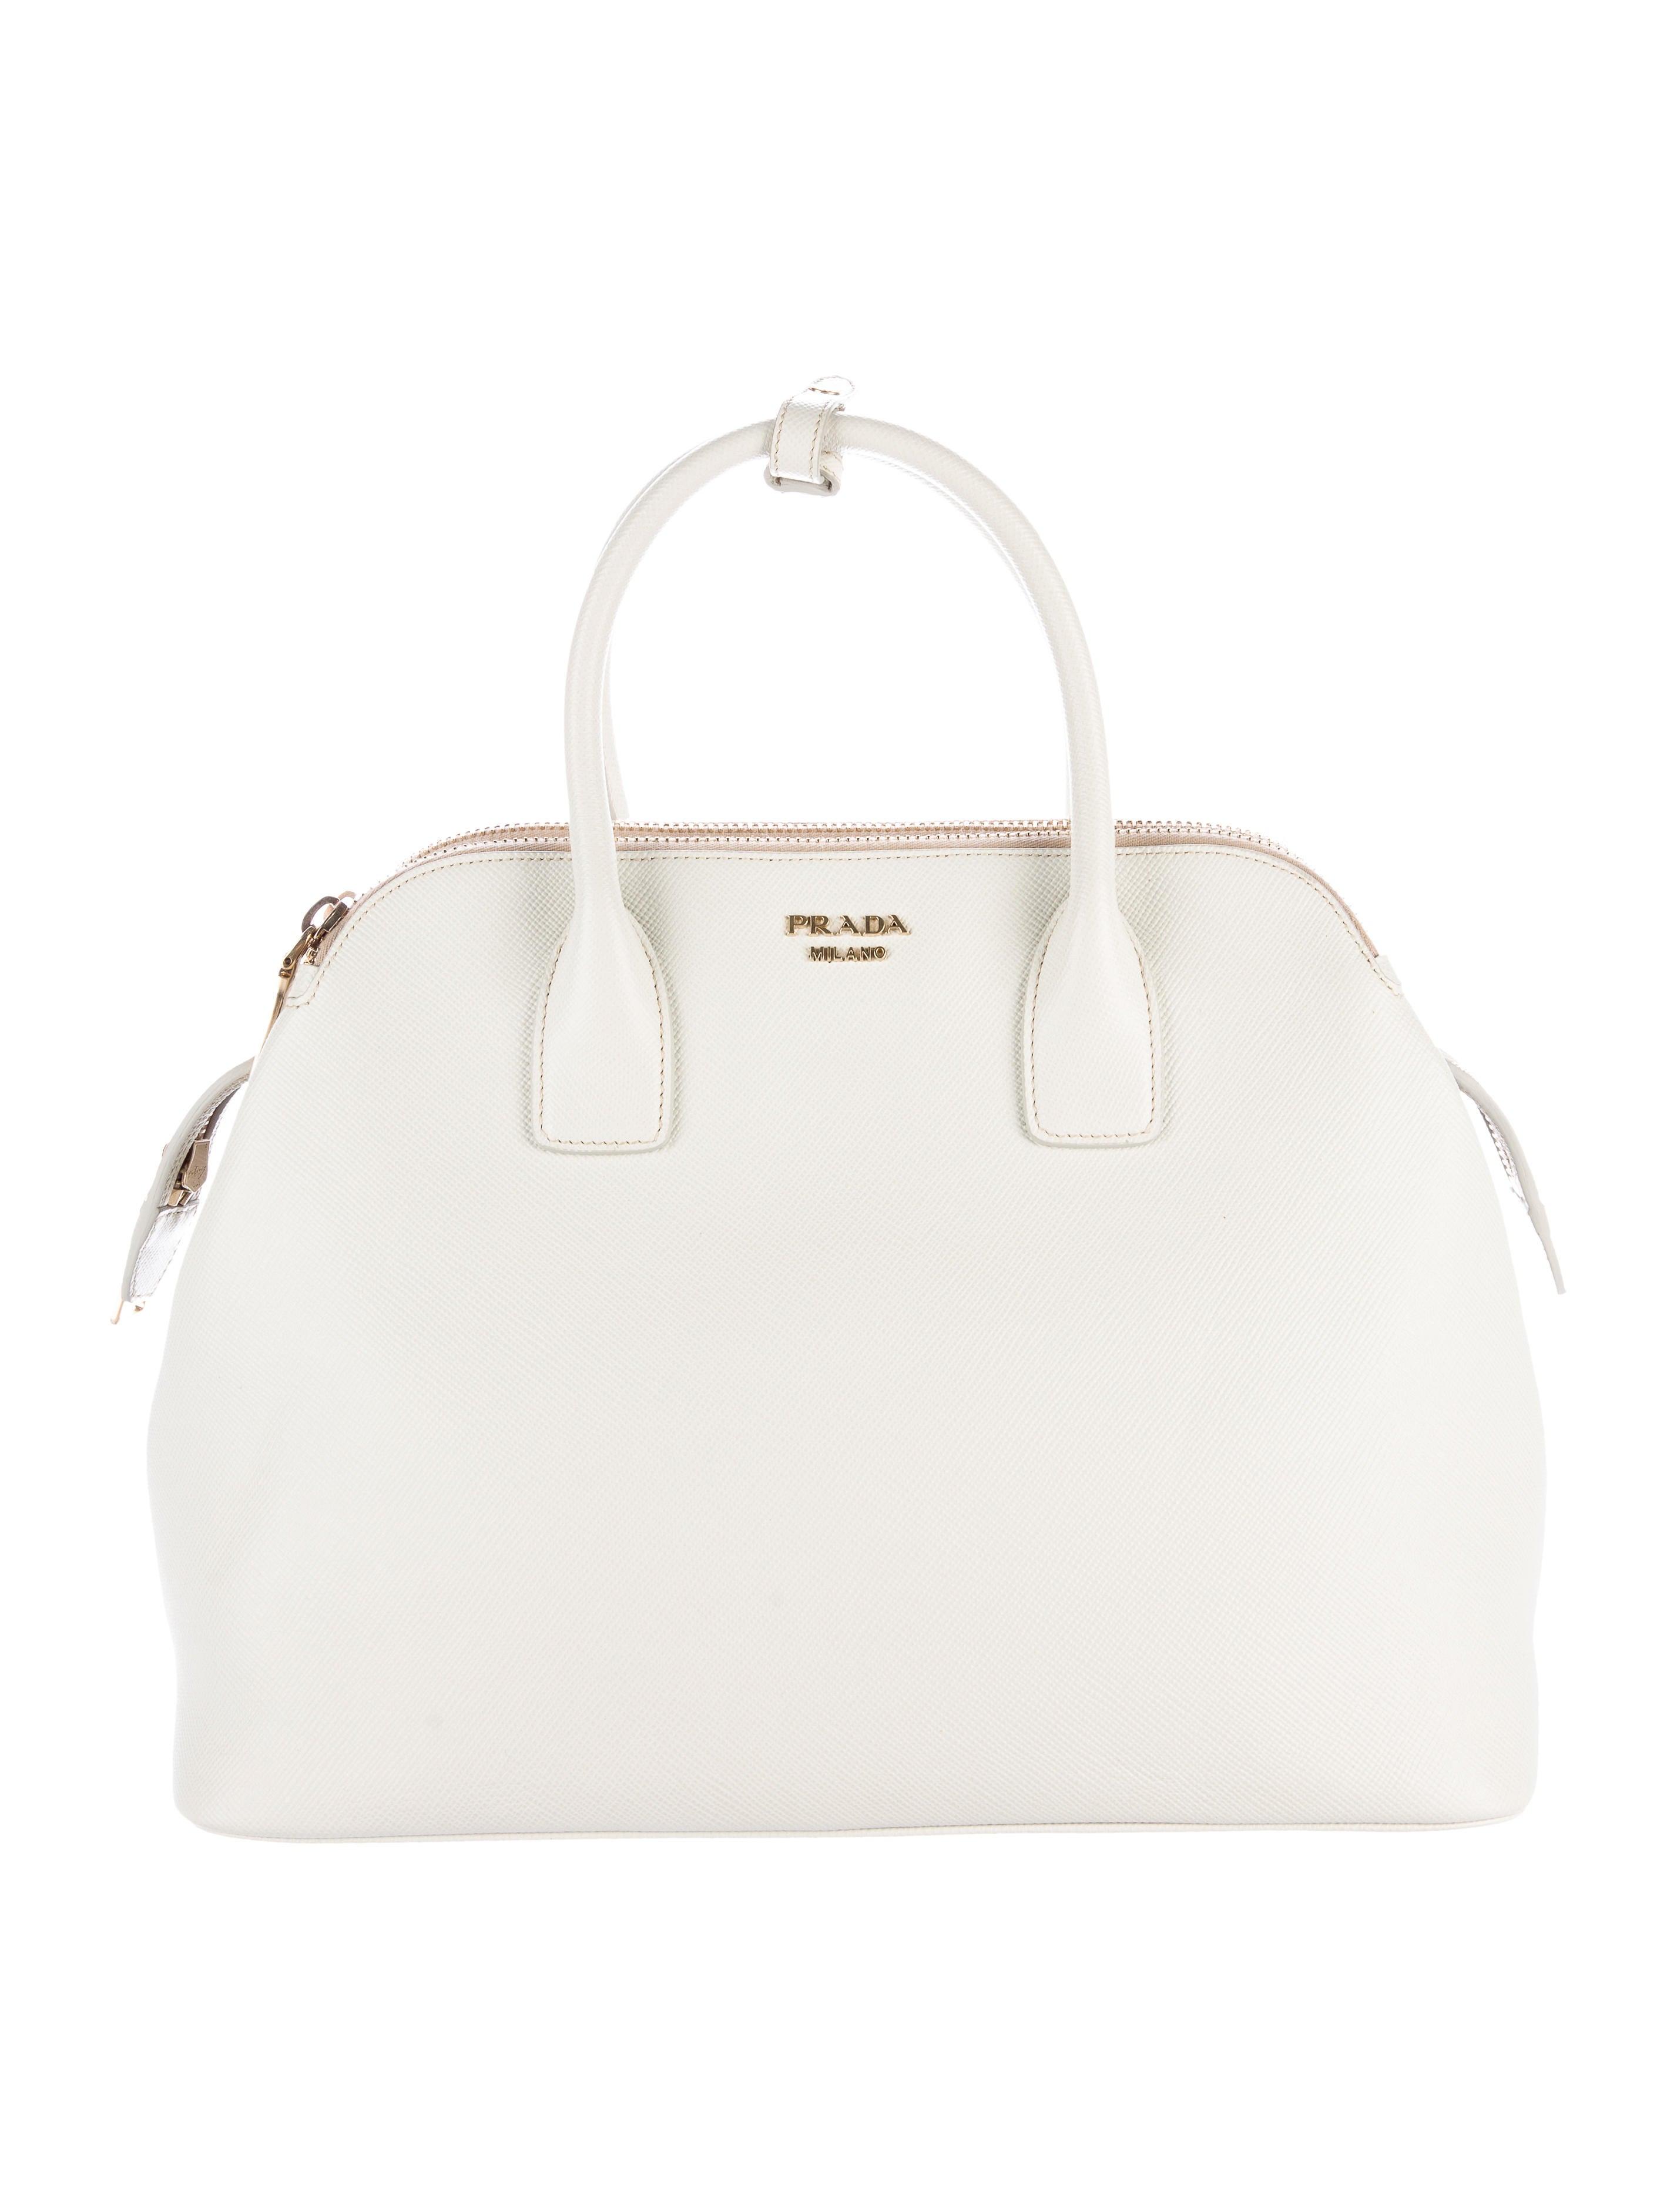 Prada Saffiano Cuir Triple-Zip Dome Tote - Handbags - PRA155290 ... 1a57ac31cf